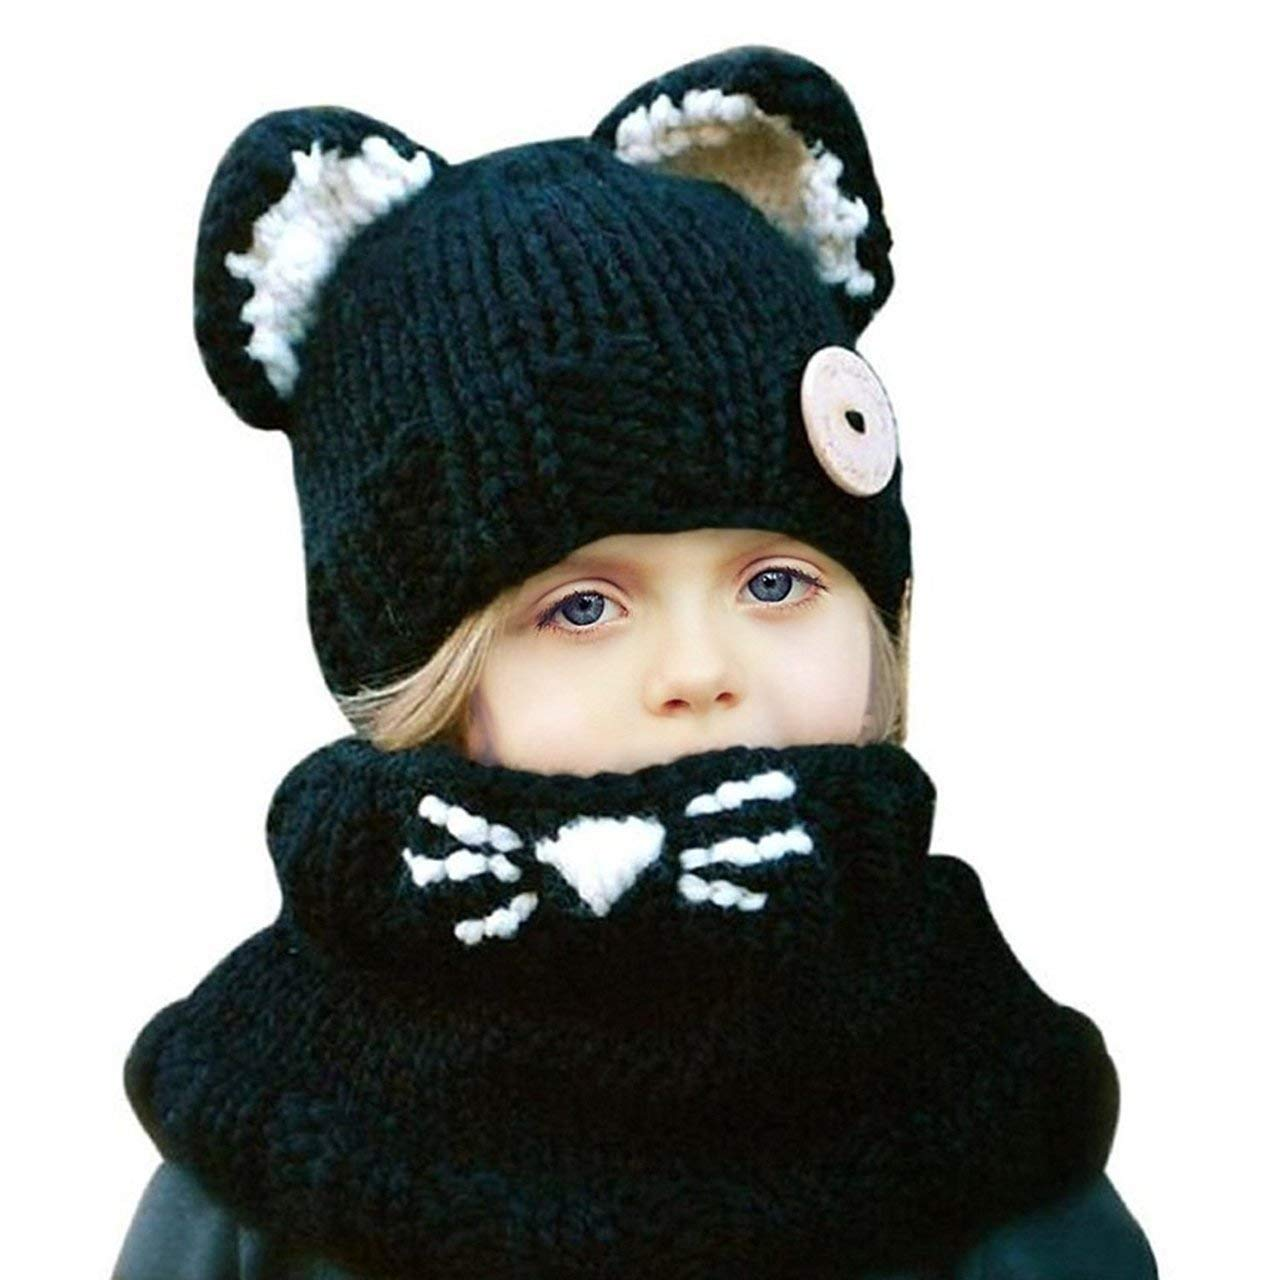 Baby Kids Warm Winter Hat Crochet Knitted Caps Scarves Cute Beanies Ear Warmers Cartoon Fox Rabbit Bear Wolf Cloak Woolen Cap Coat Set Honeststar HS-Childhulimao-Black